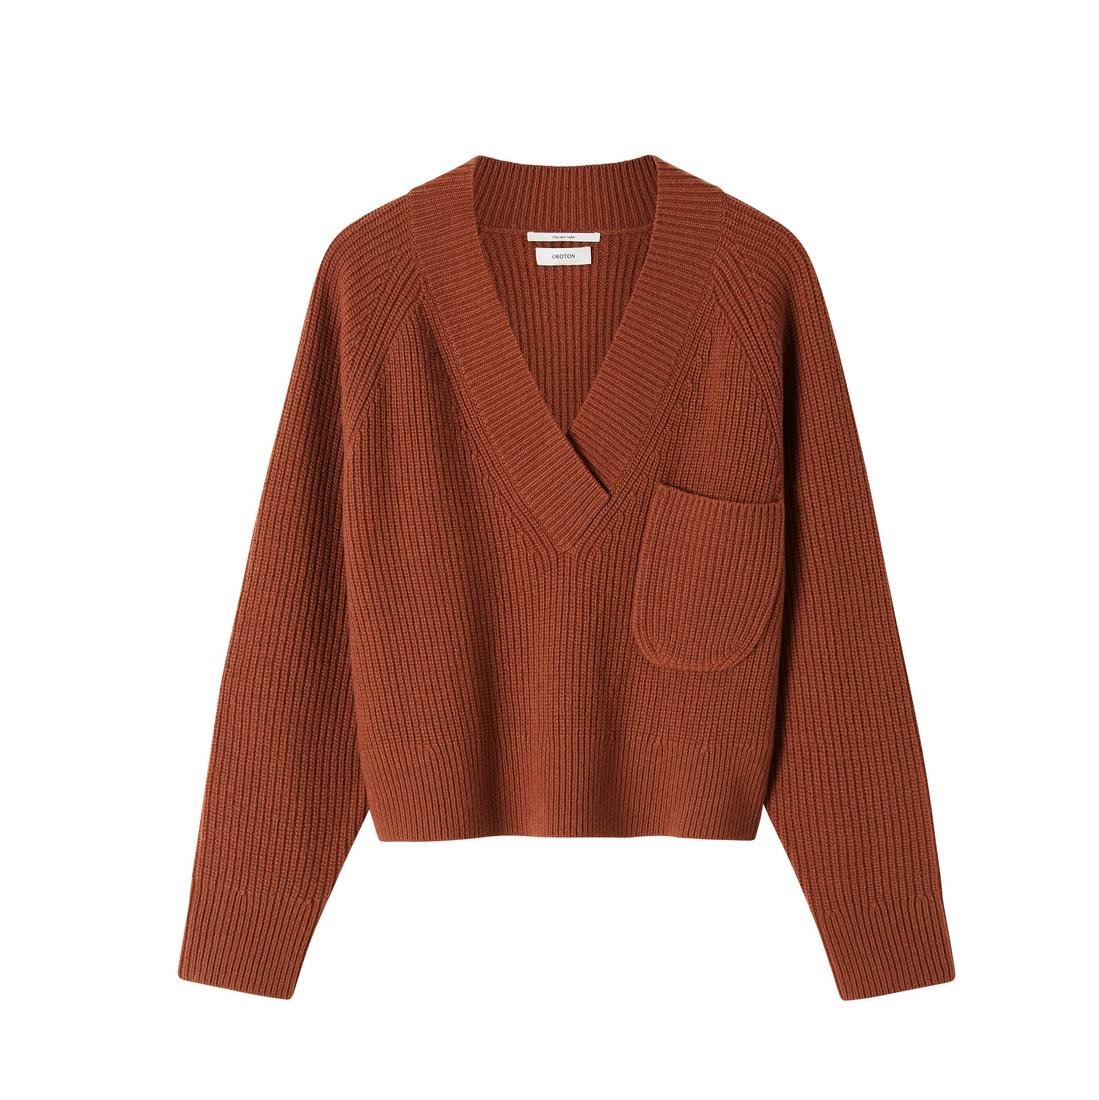 Oroton Wool V-Neck Rib Knit Sweater